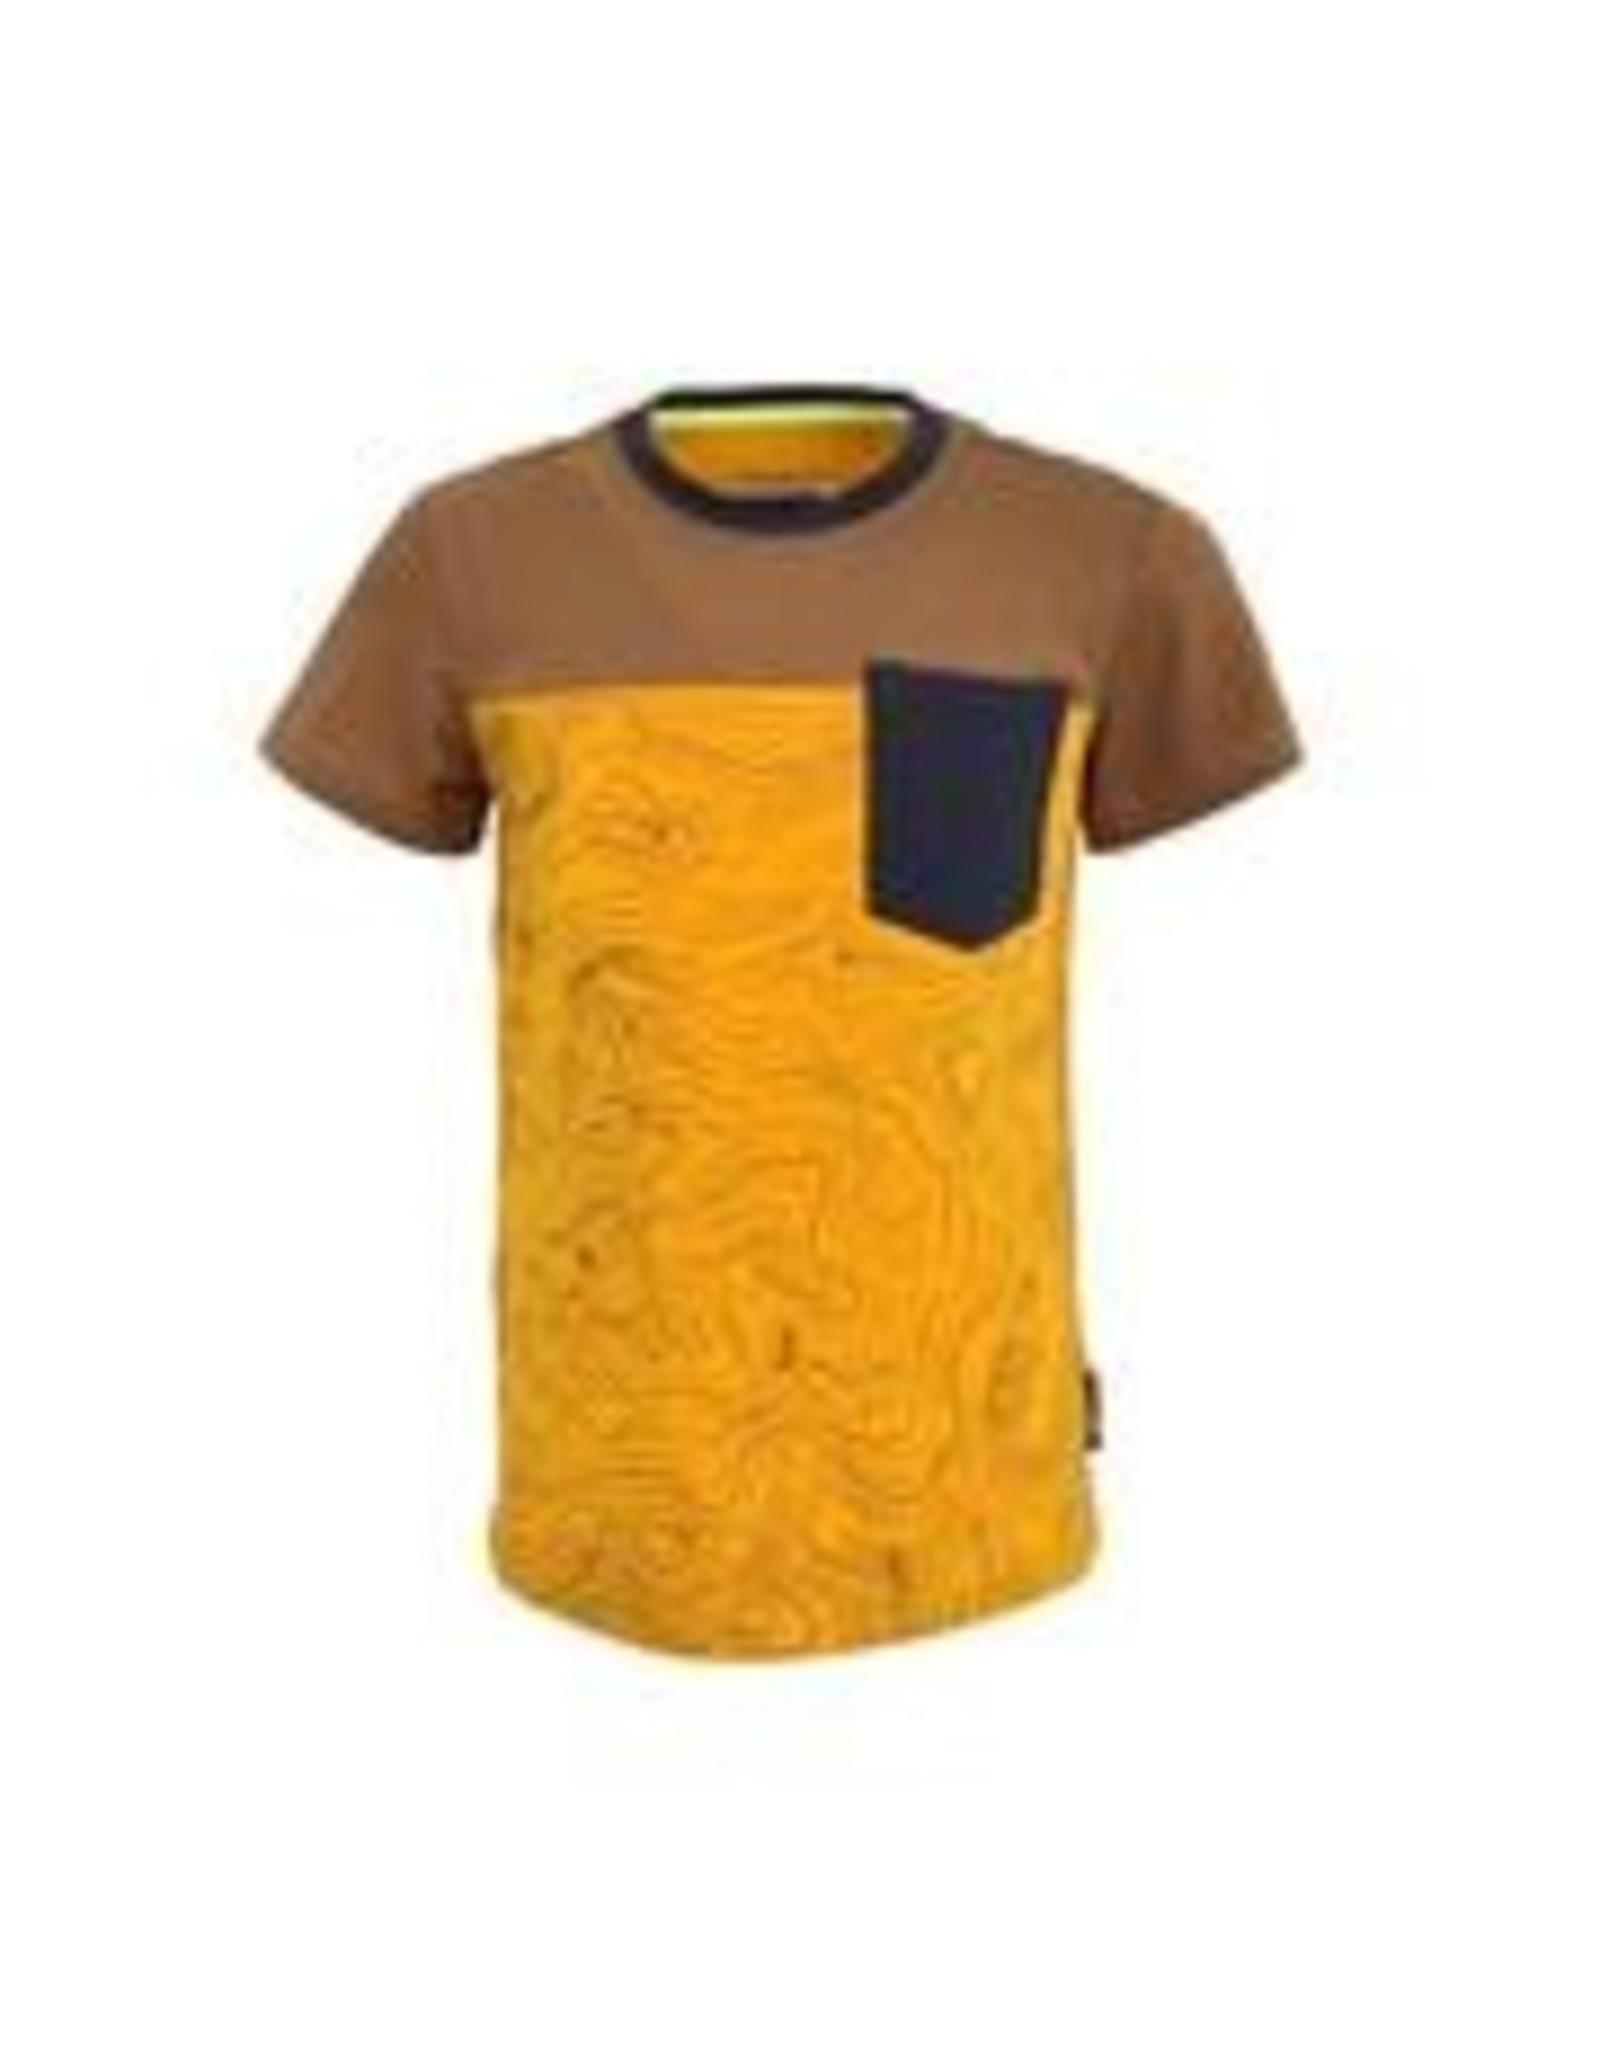 Legends T-shirt Onno Brown